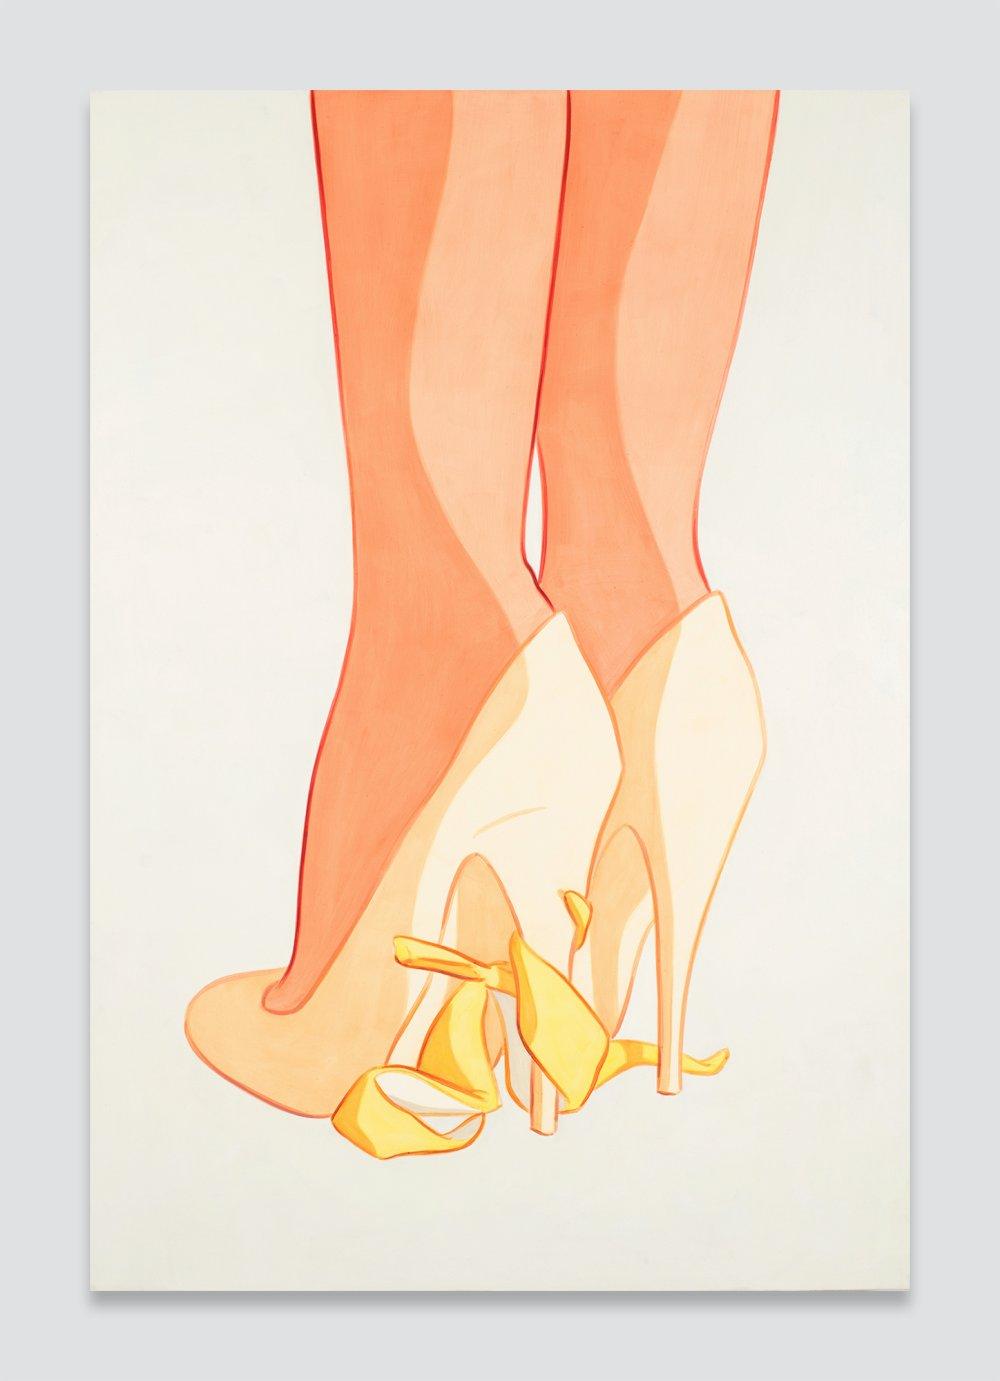 Heels, Peel Under Shank, Soft Wrap